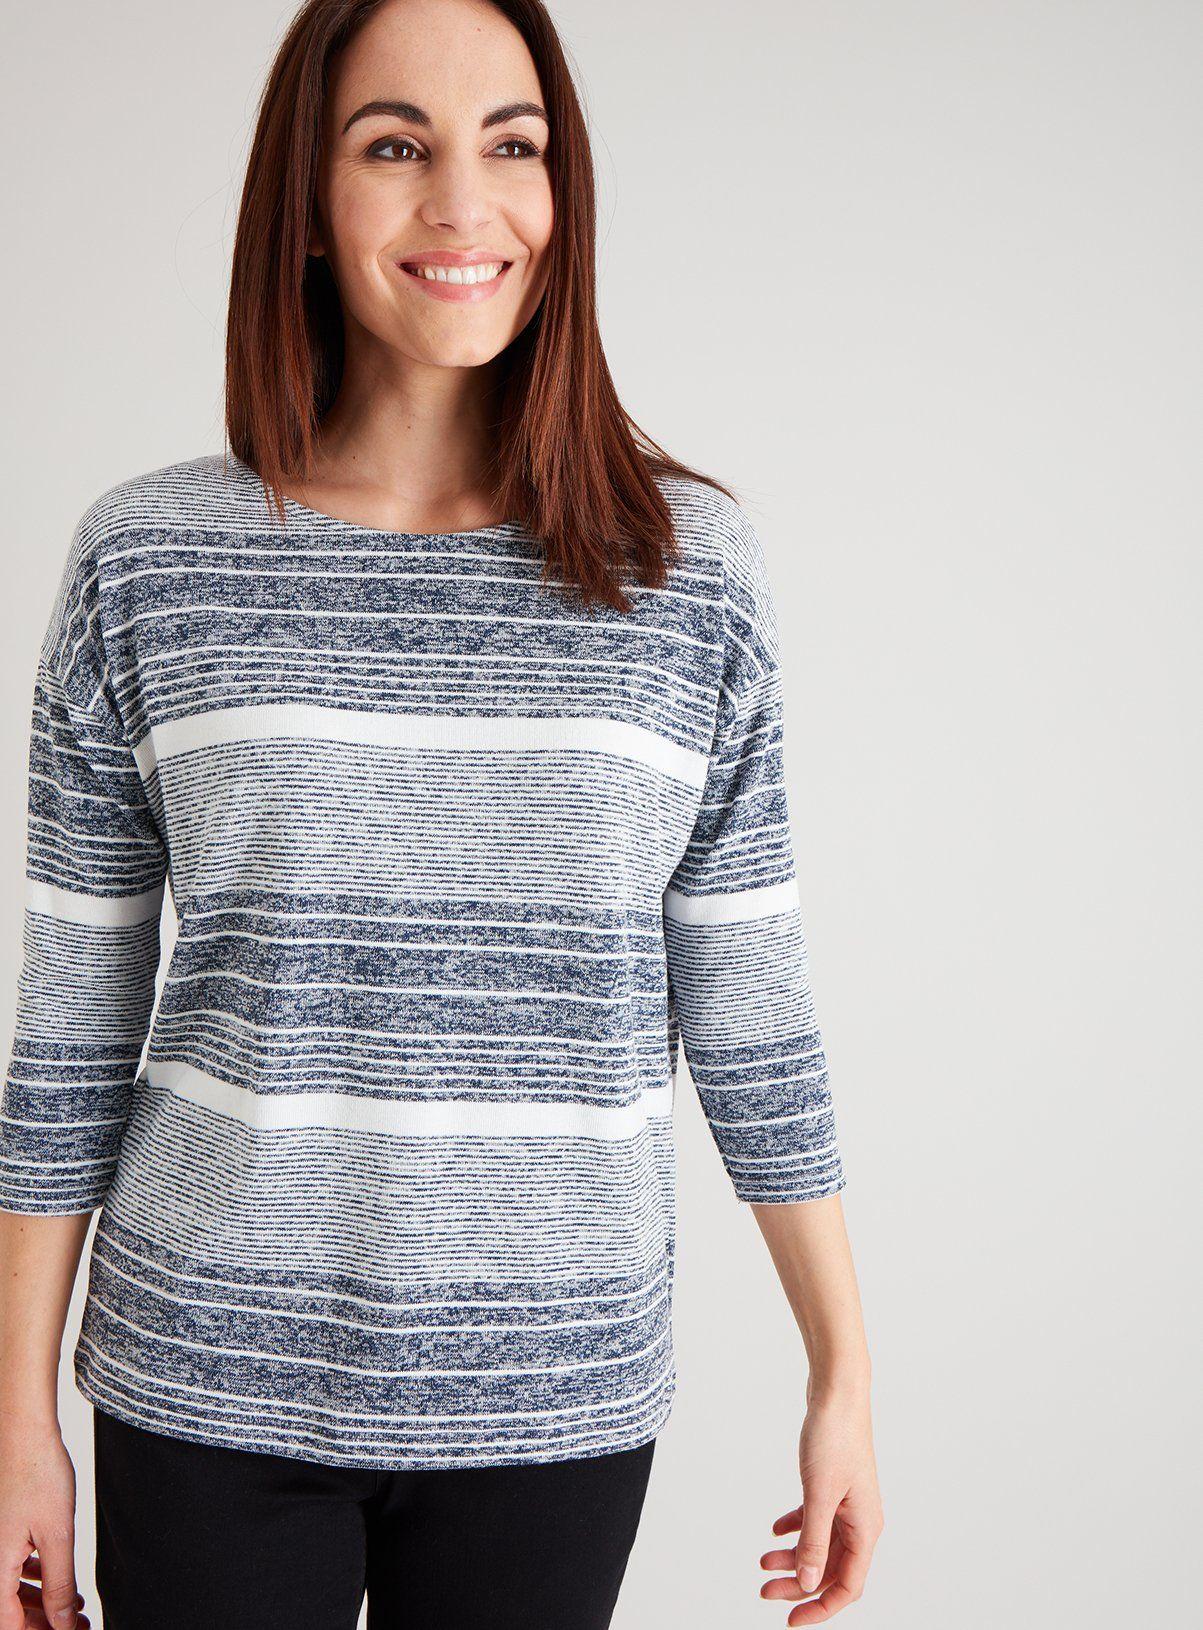 Navy Stripe Knit Look Top - 12